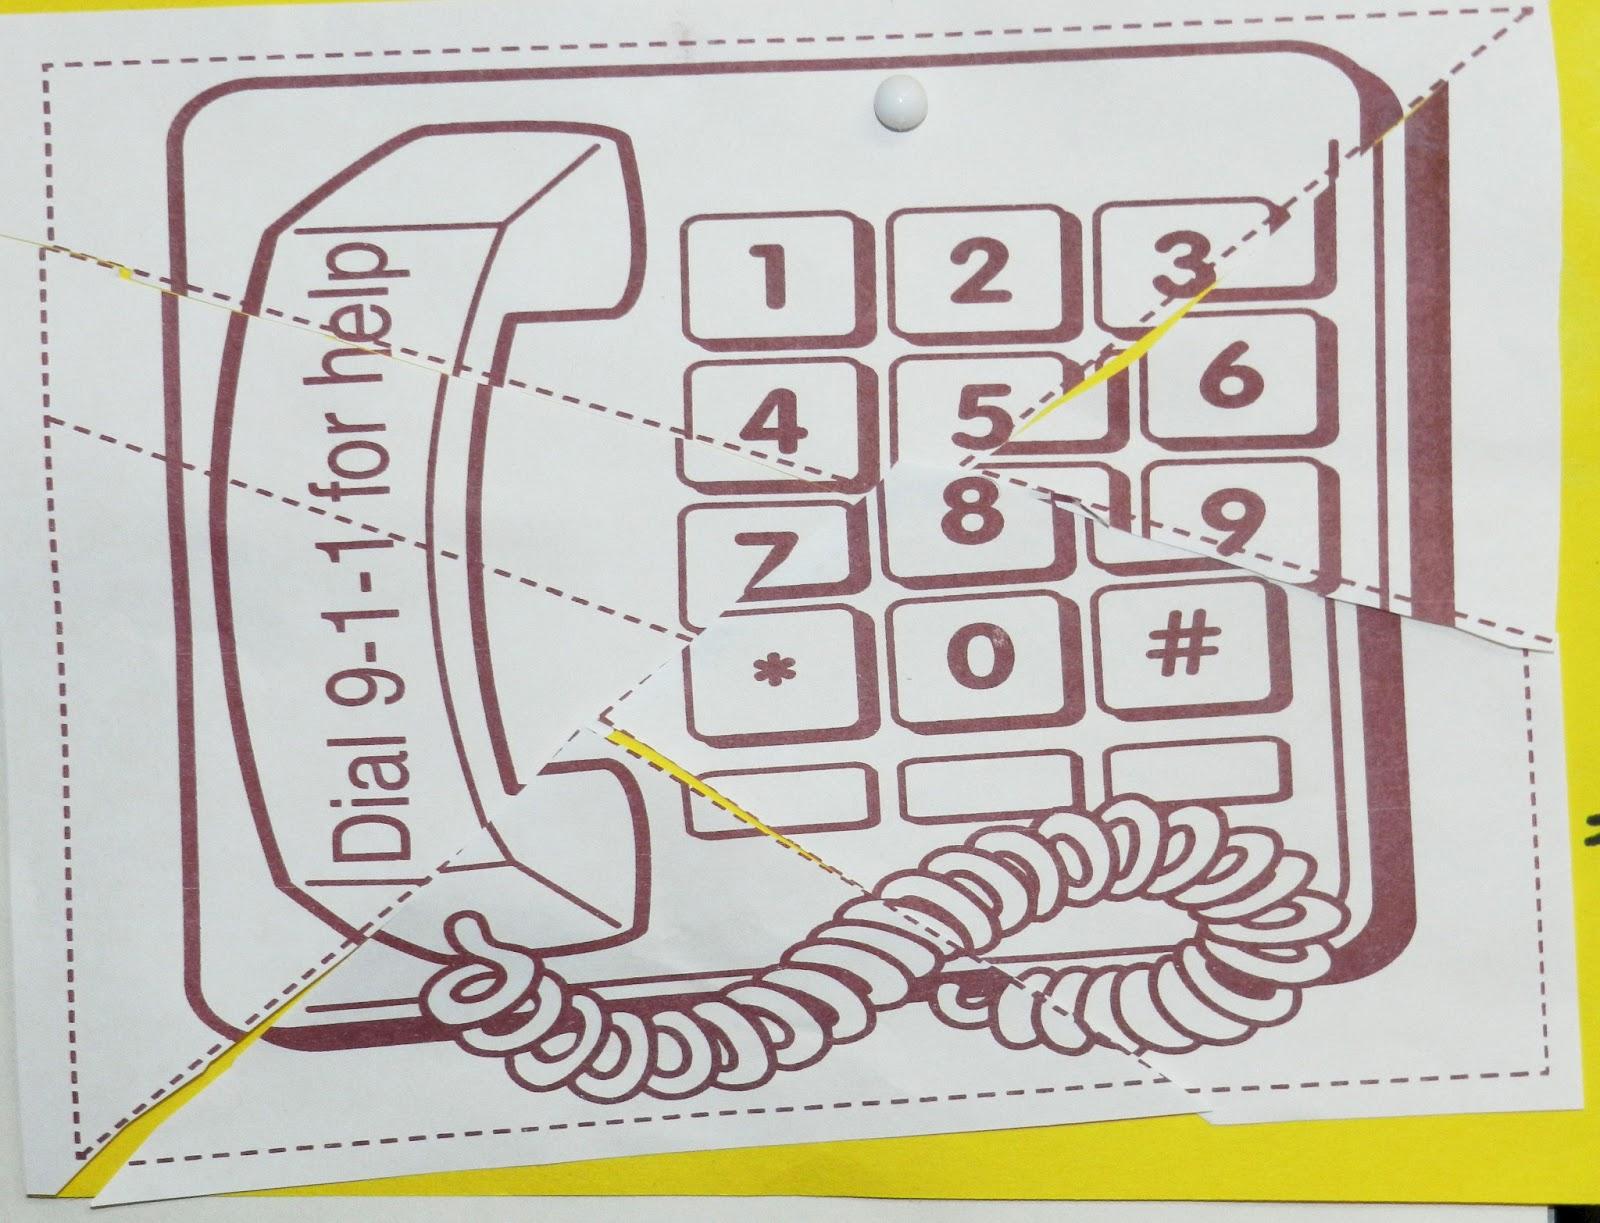 Calling 911 Worksheet For Preschool